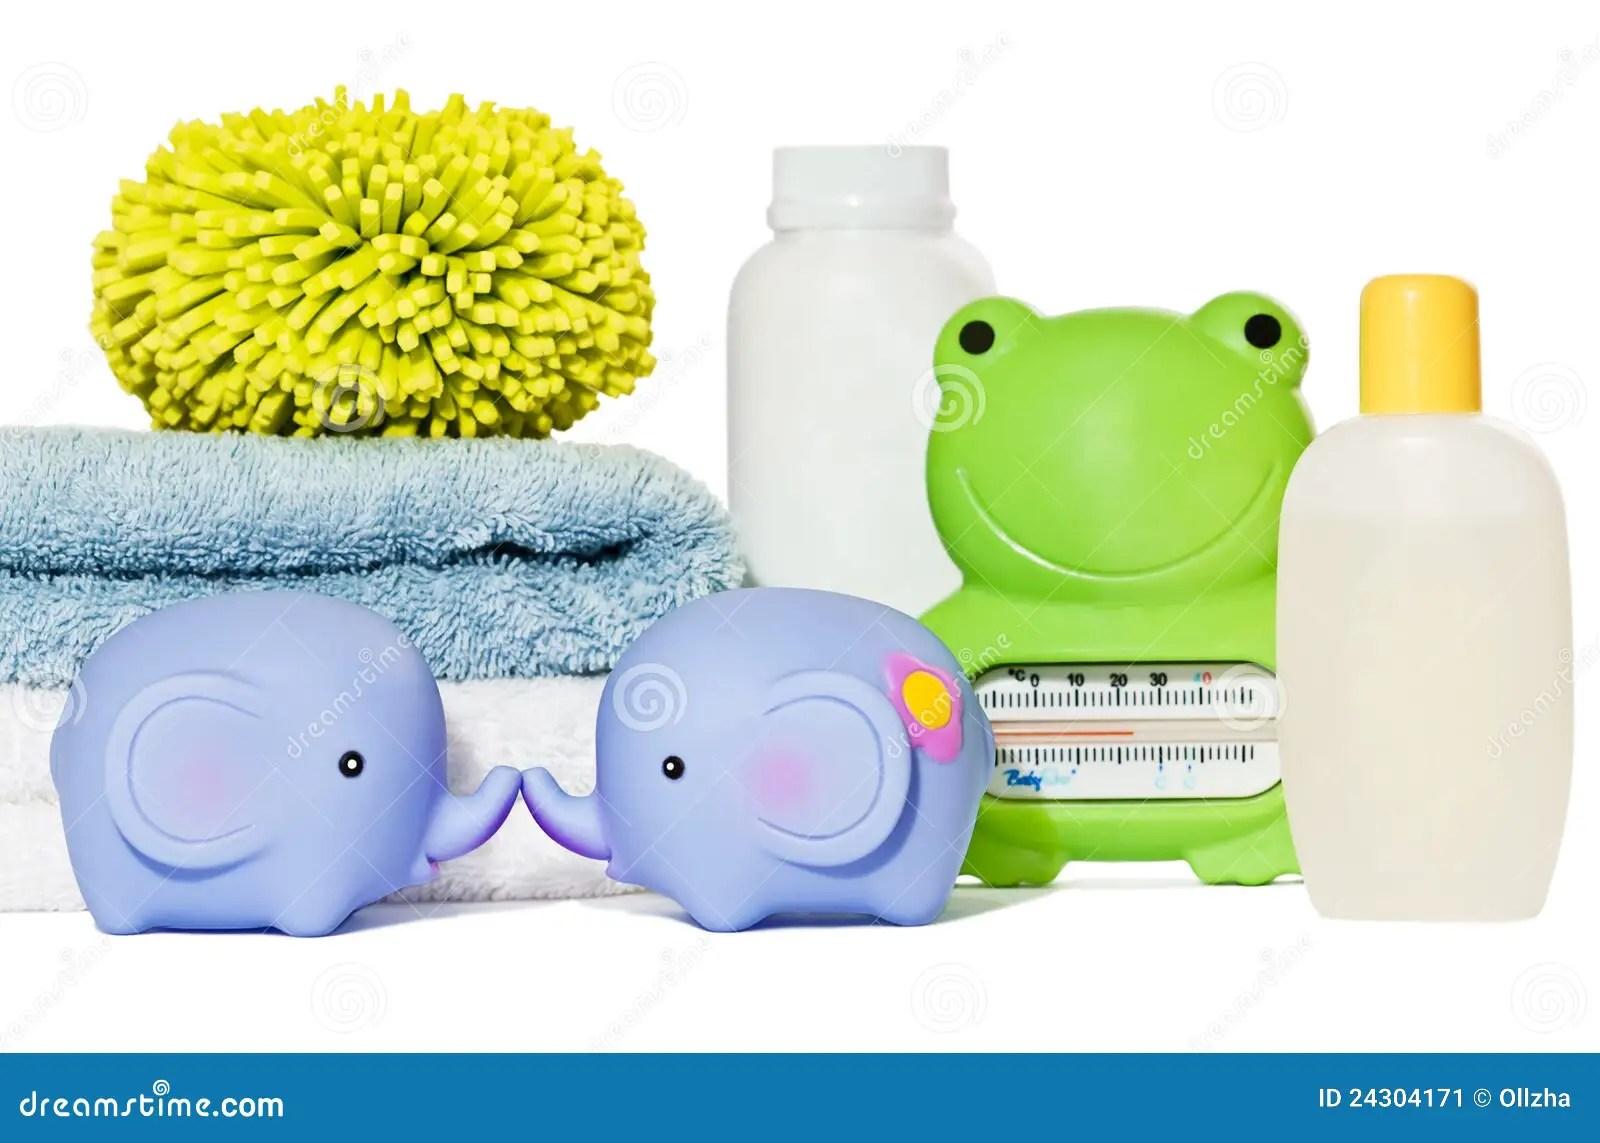 Baby Bathroom Accessories Ierie Com Baby Bathroom Decor Designerstyle